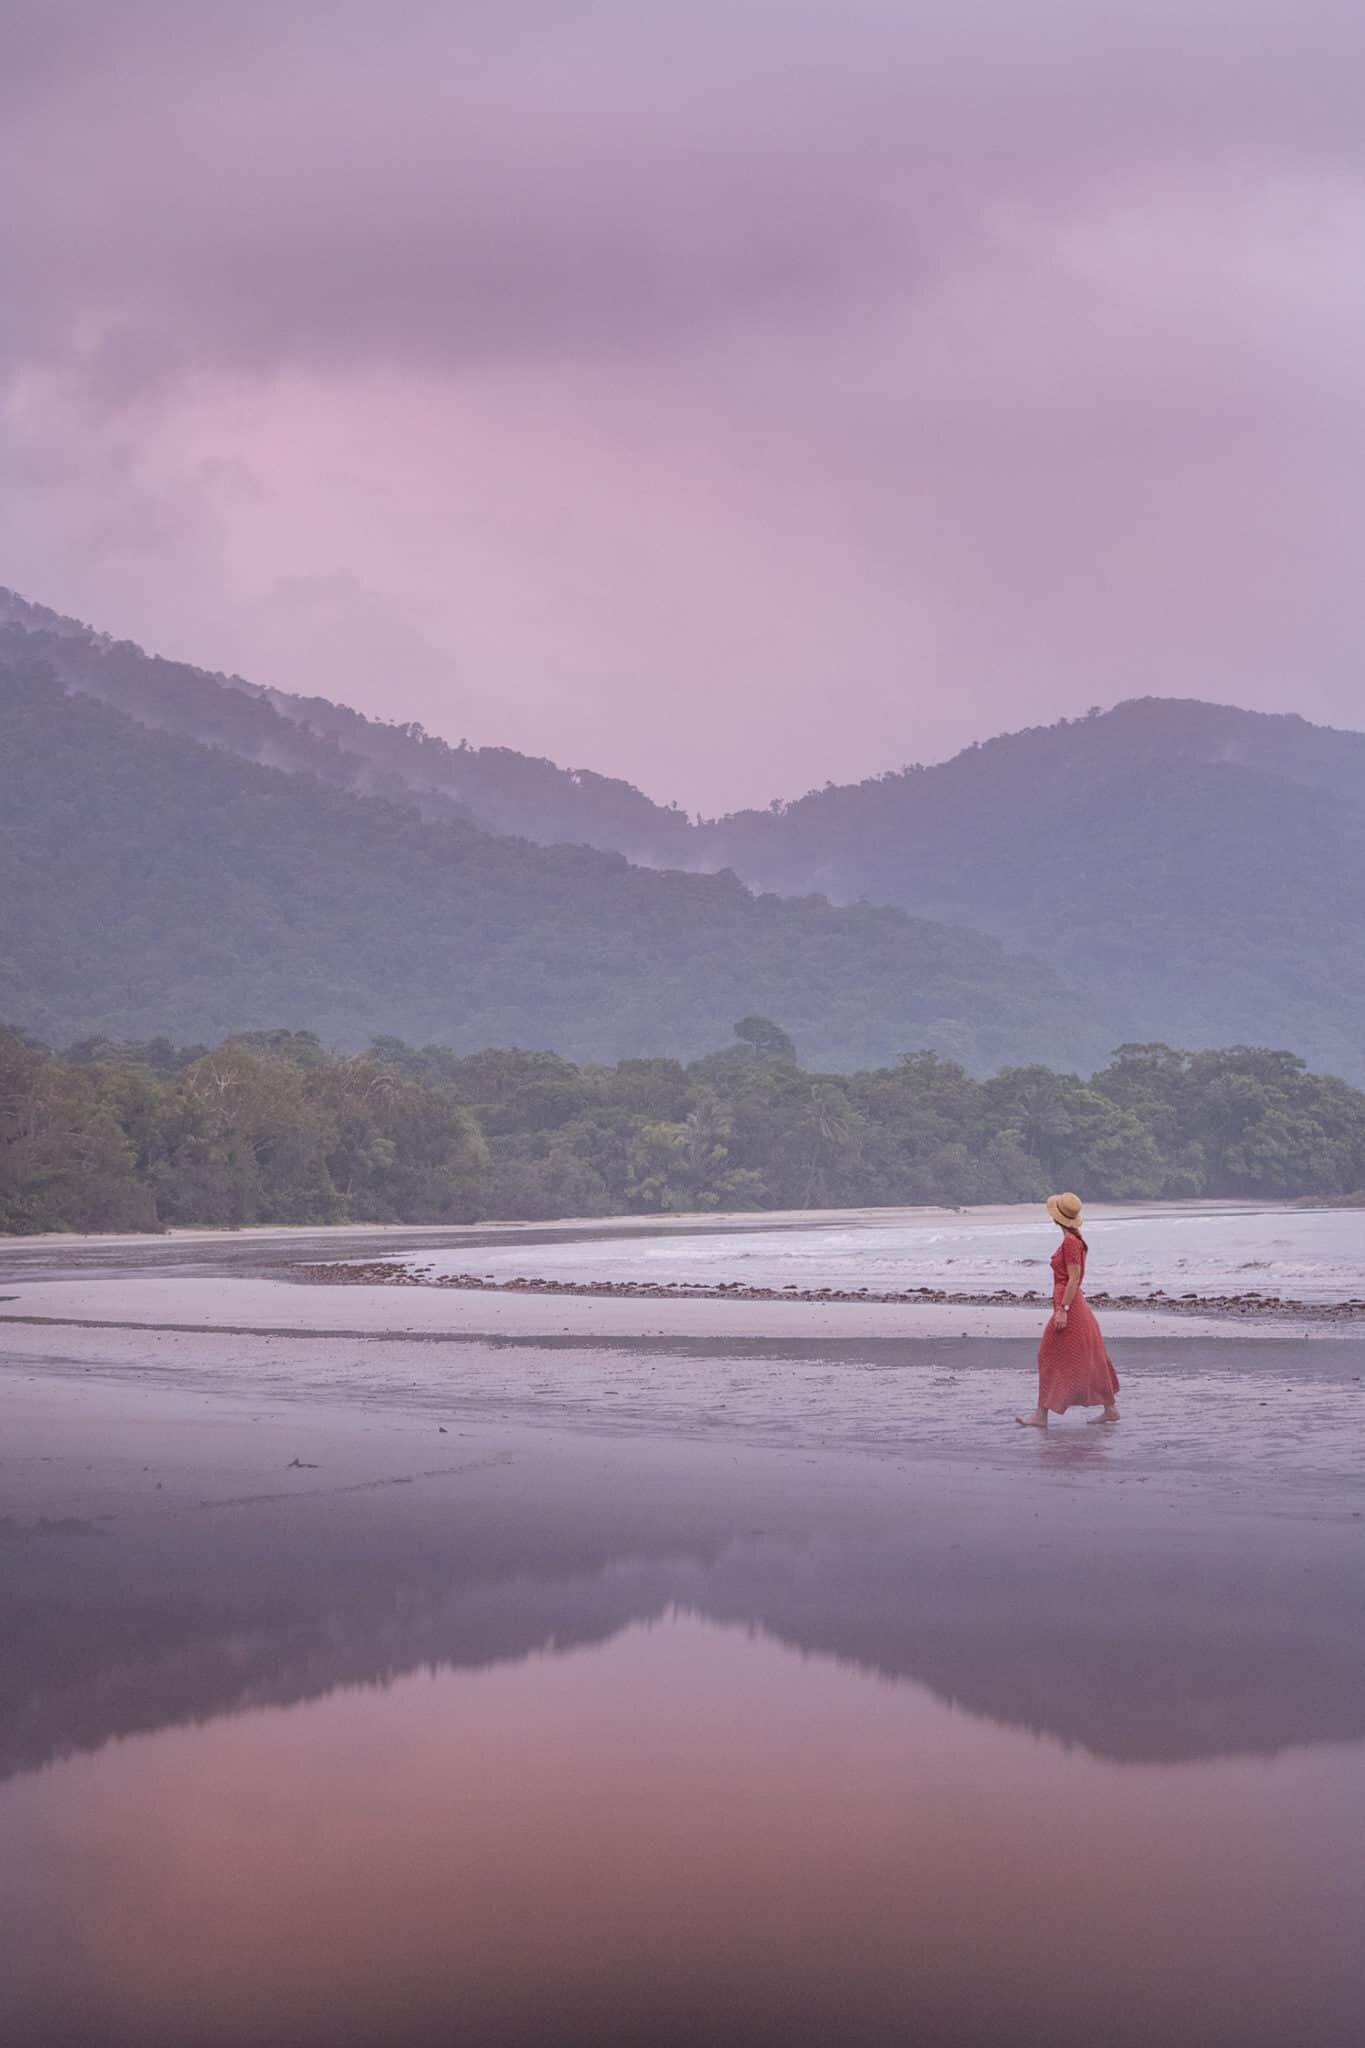 Travel photographer Lisa Michele Burns of The Wandering Lens